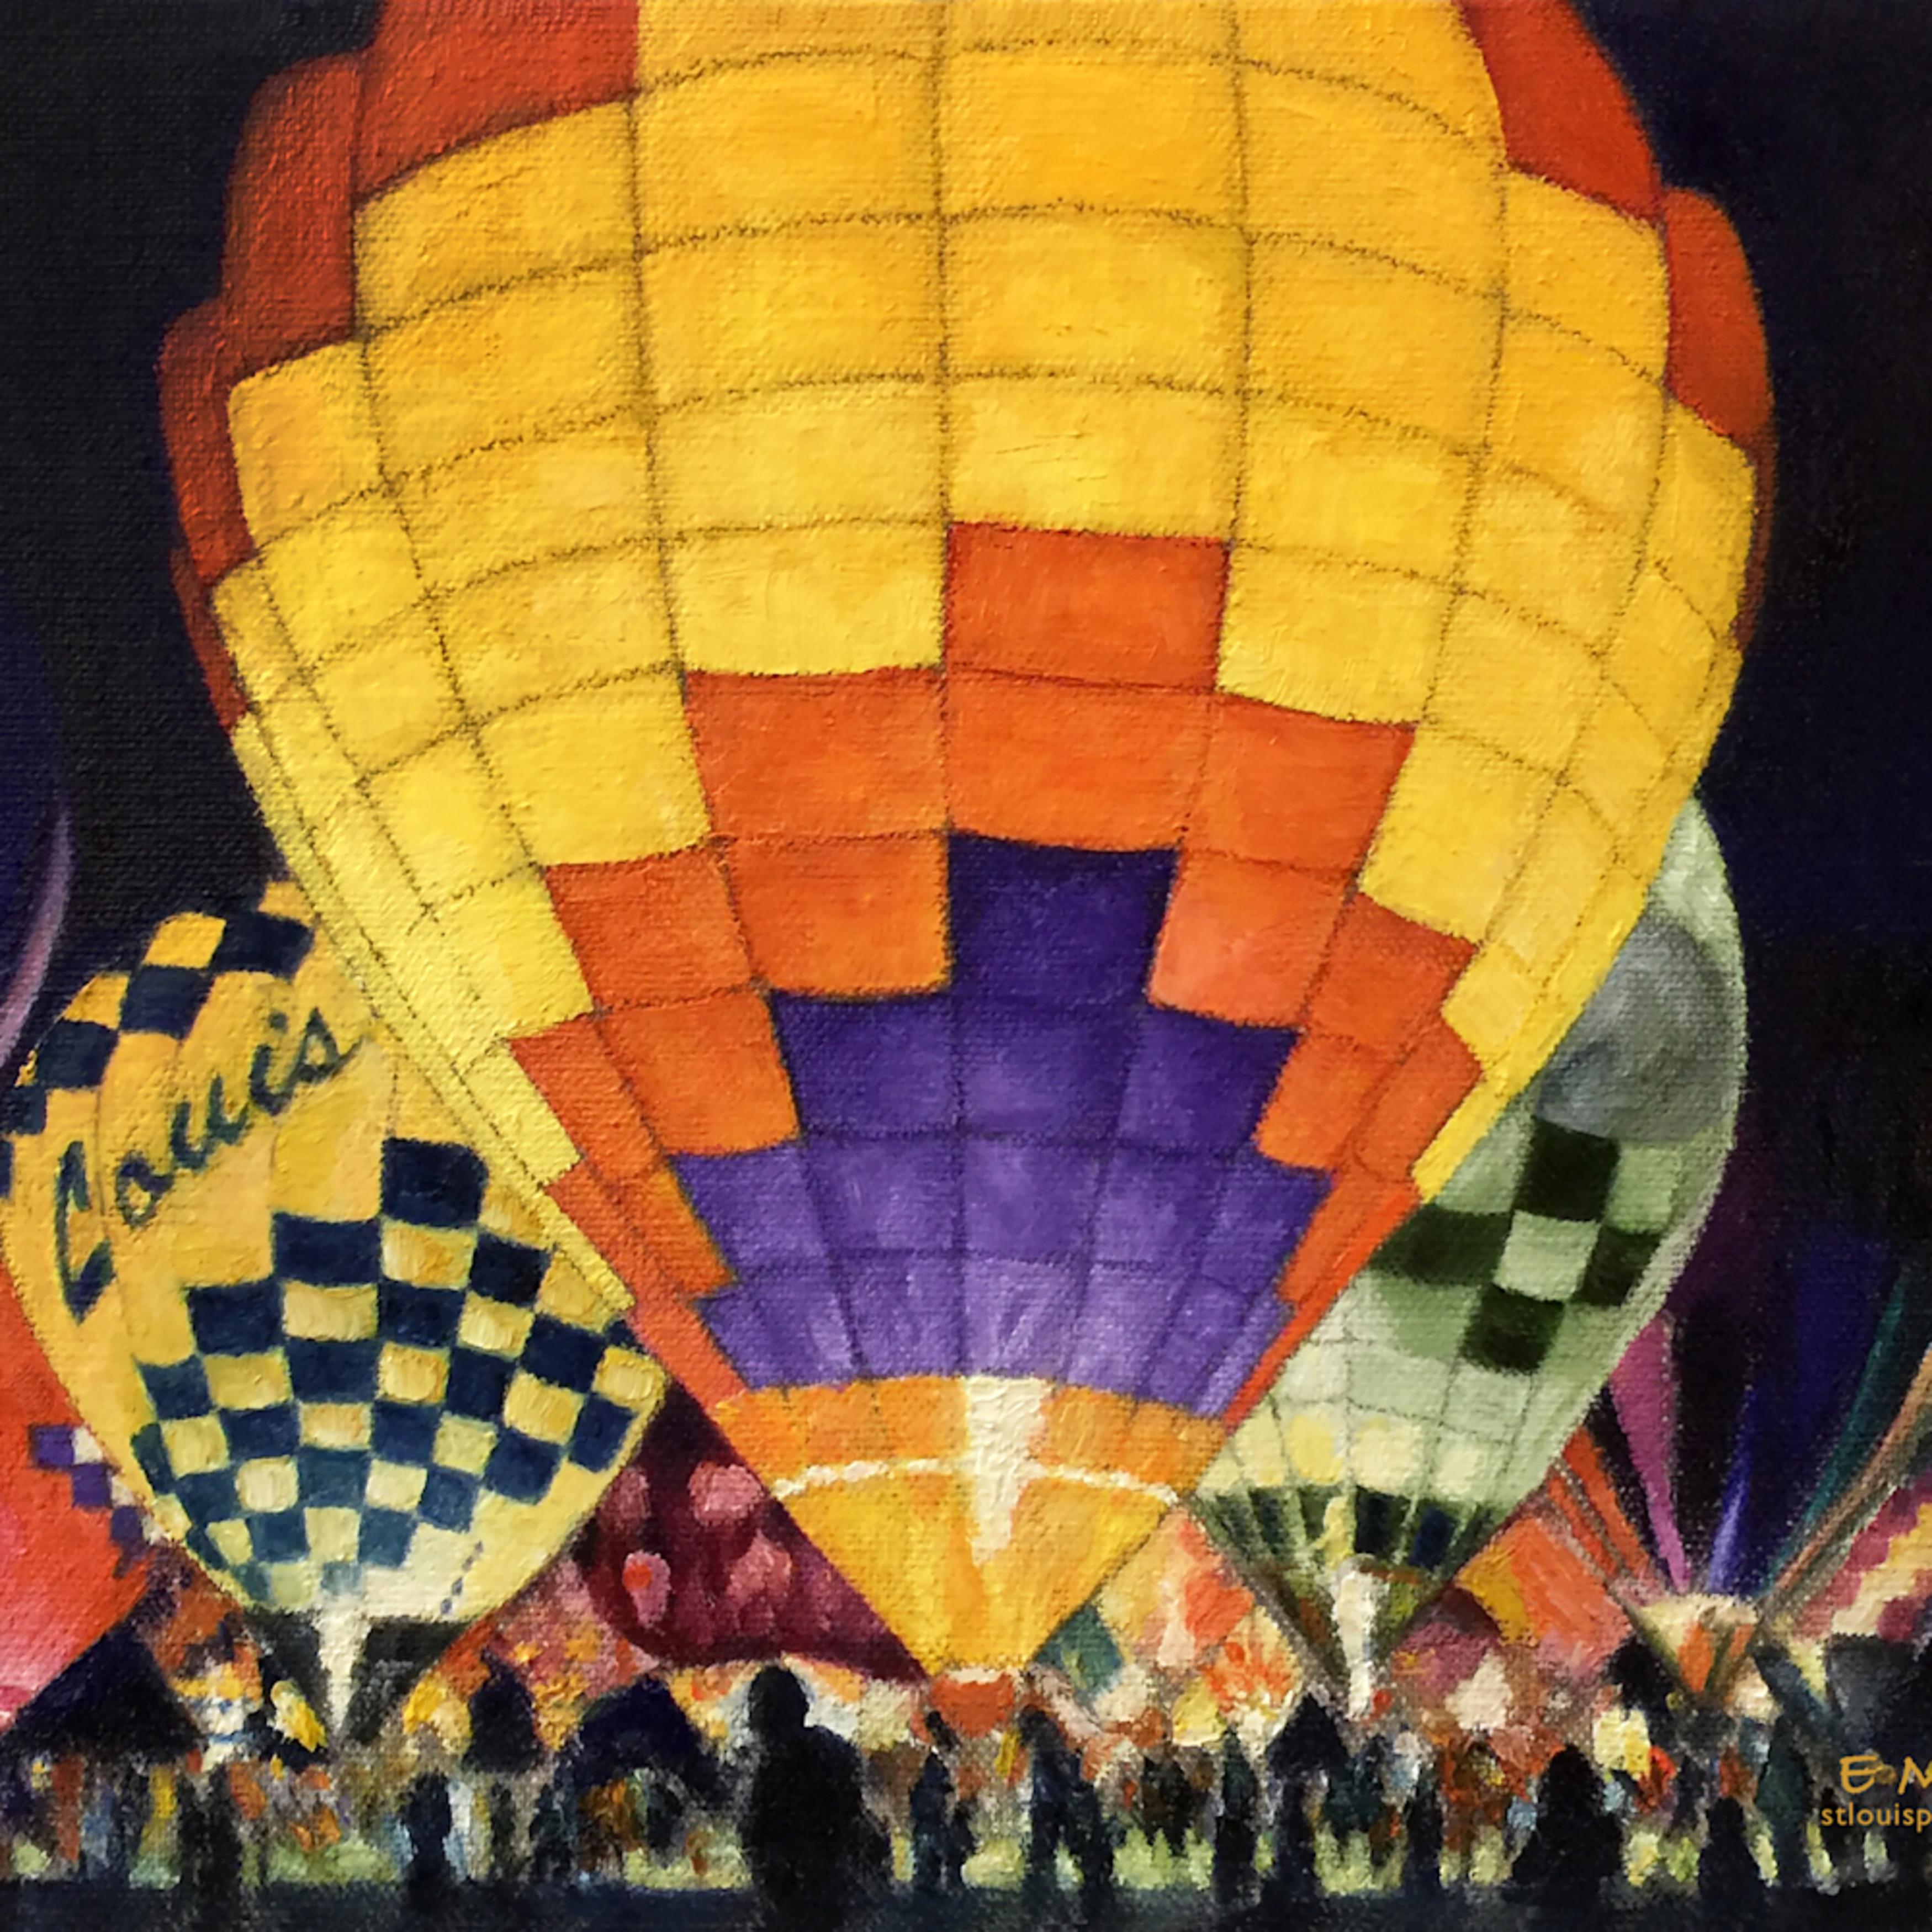 Balloonglowsignature 6816 ps3pya